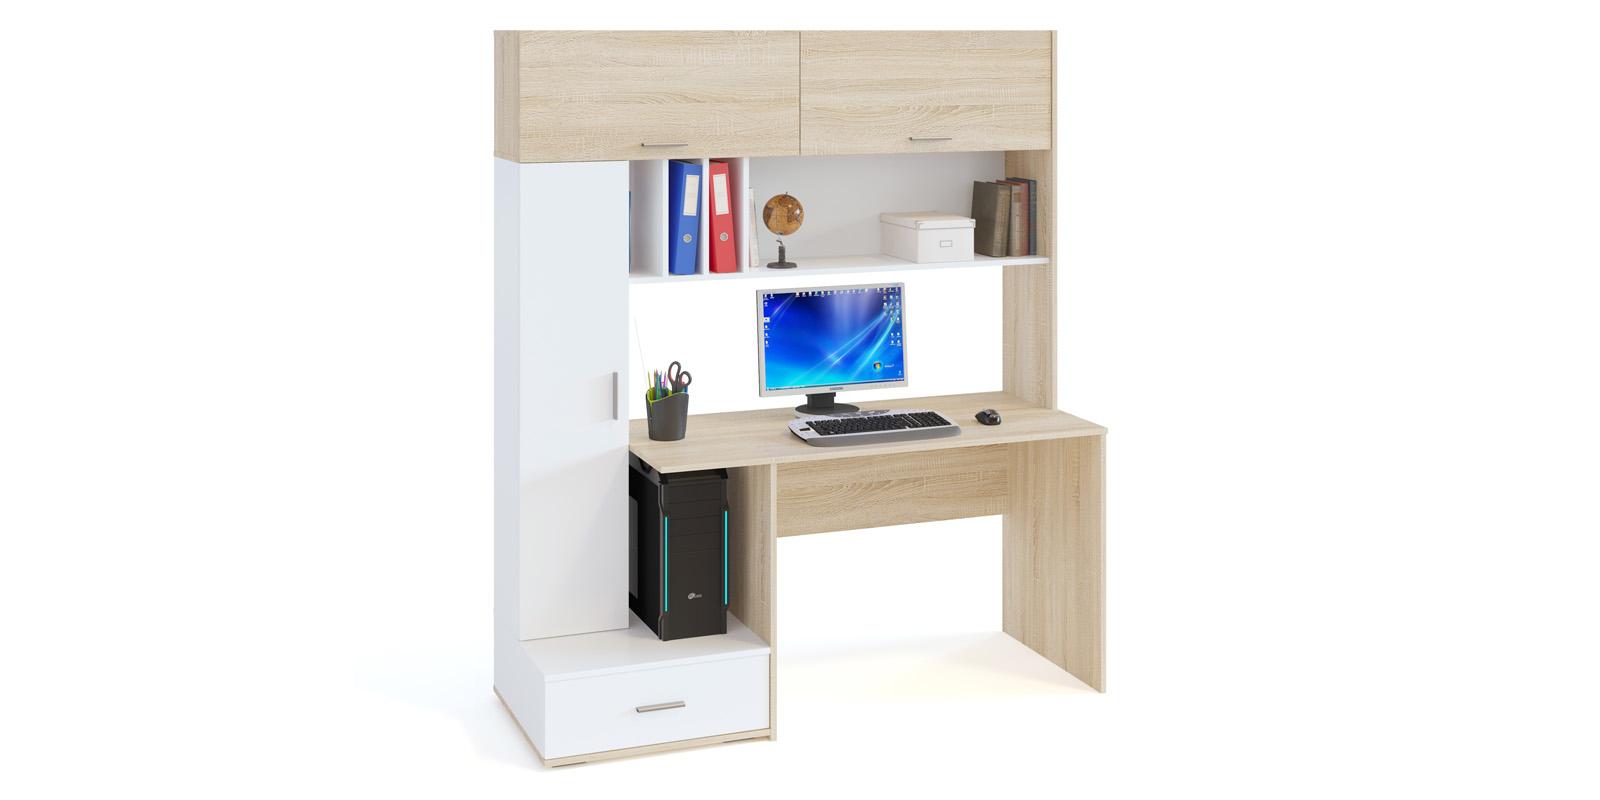 Стол компьютерный Нортон (дуб сонома/белый)